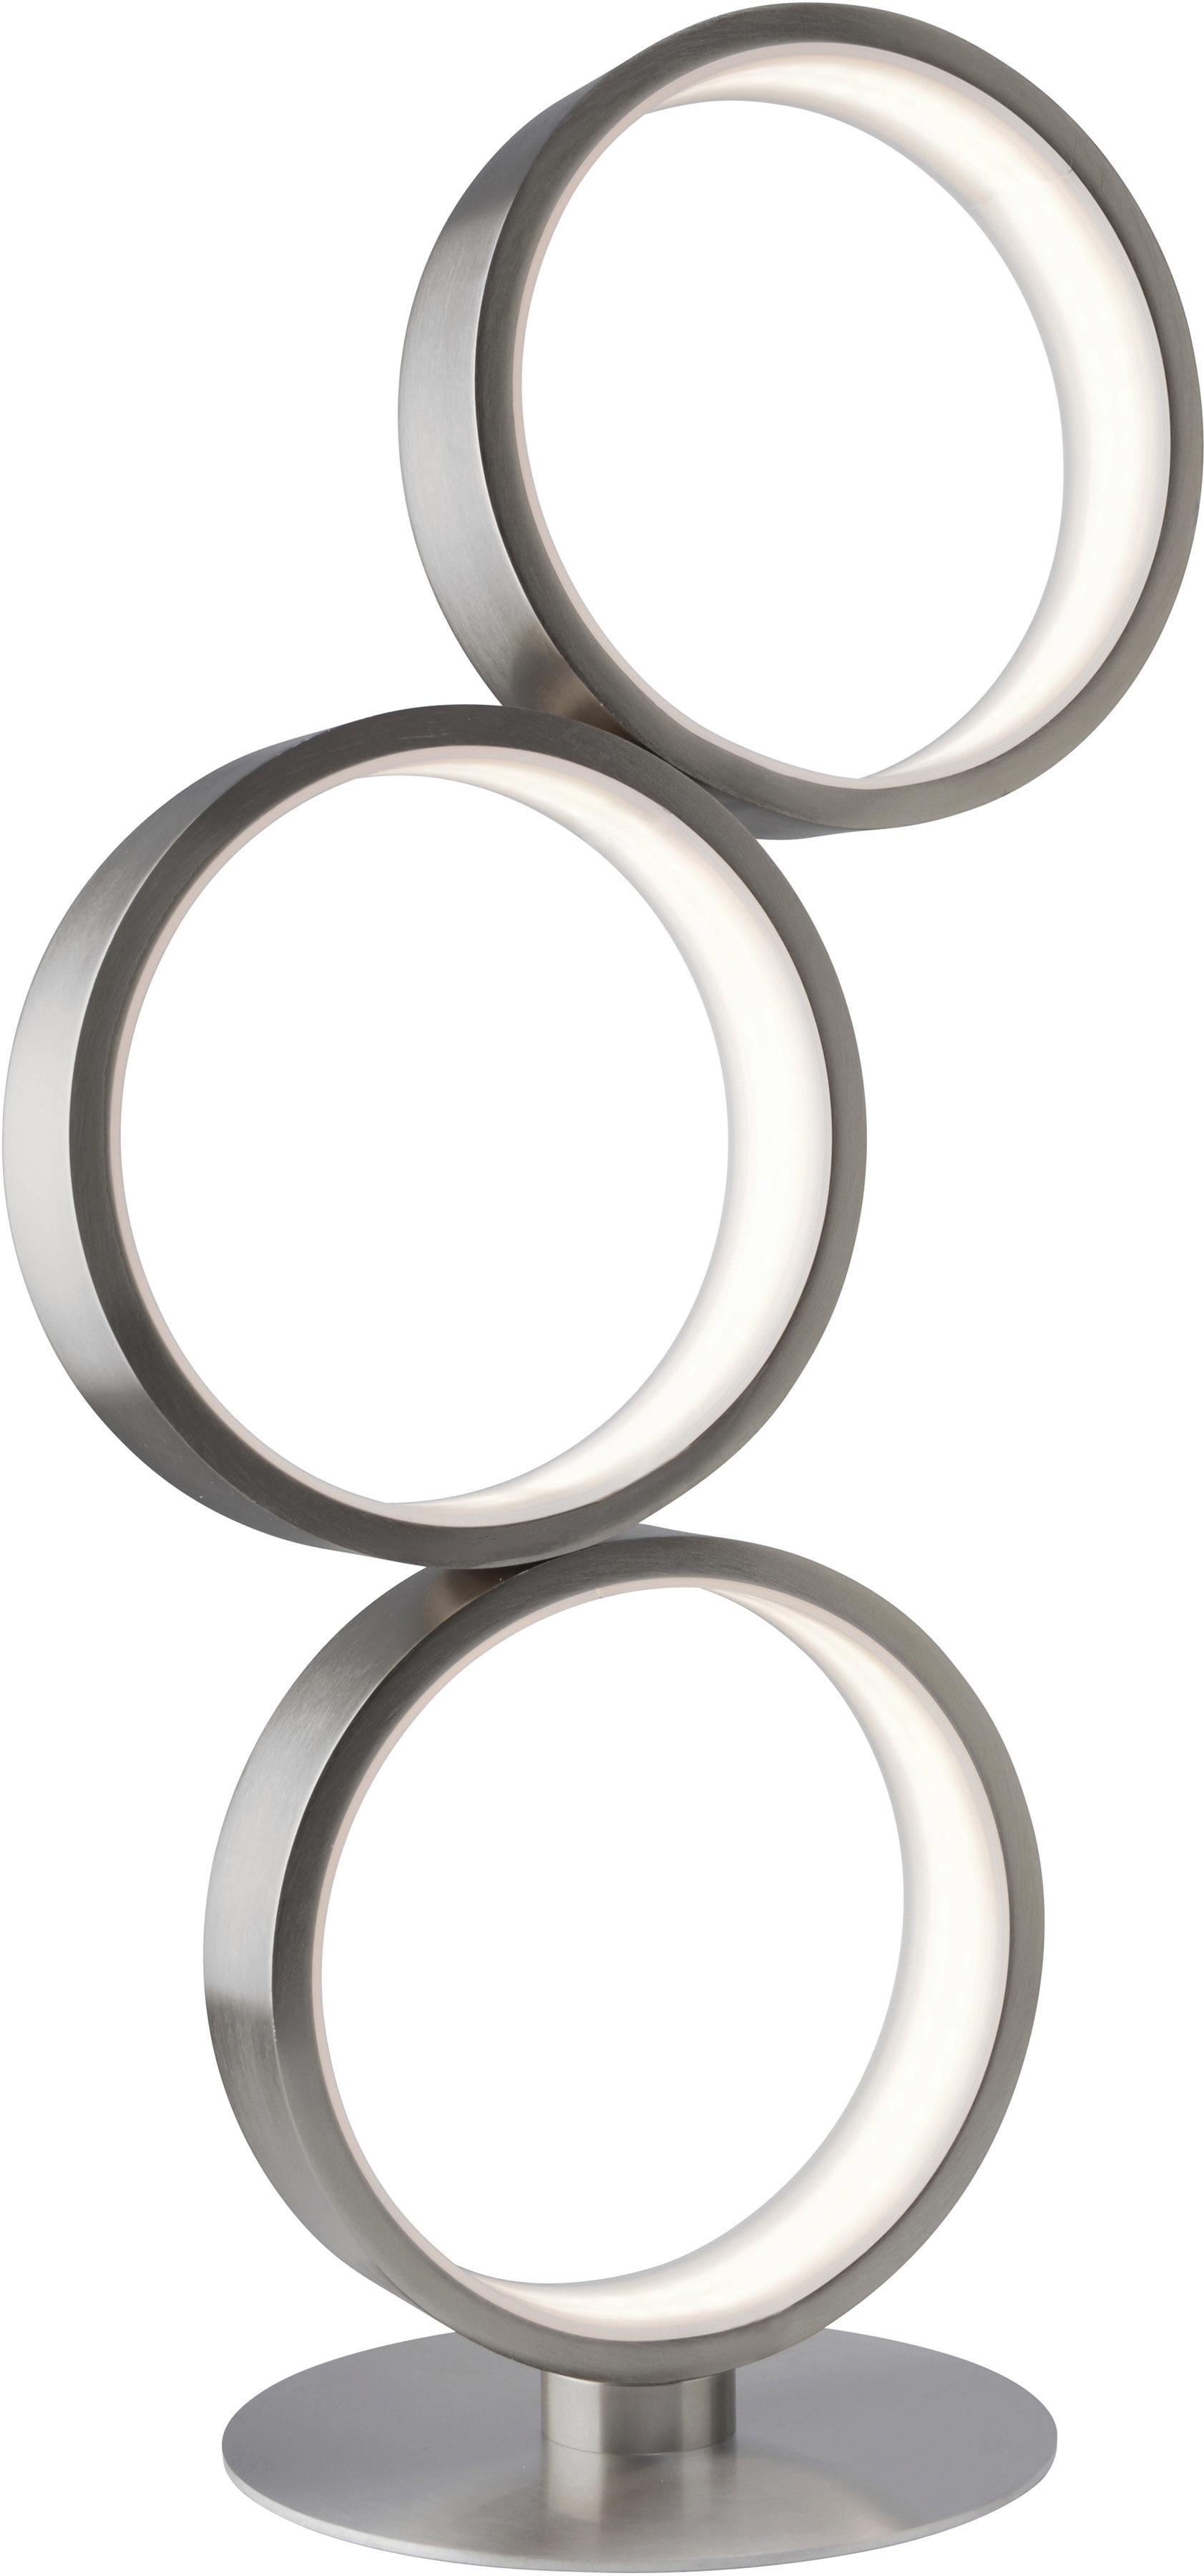 SOMPEX LED Tischleuchte Loop, LED-Board, Warmweiß